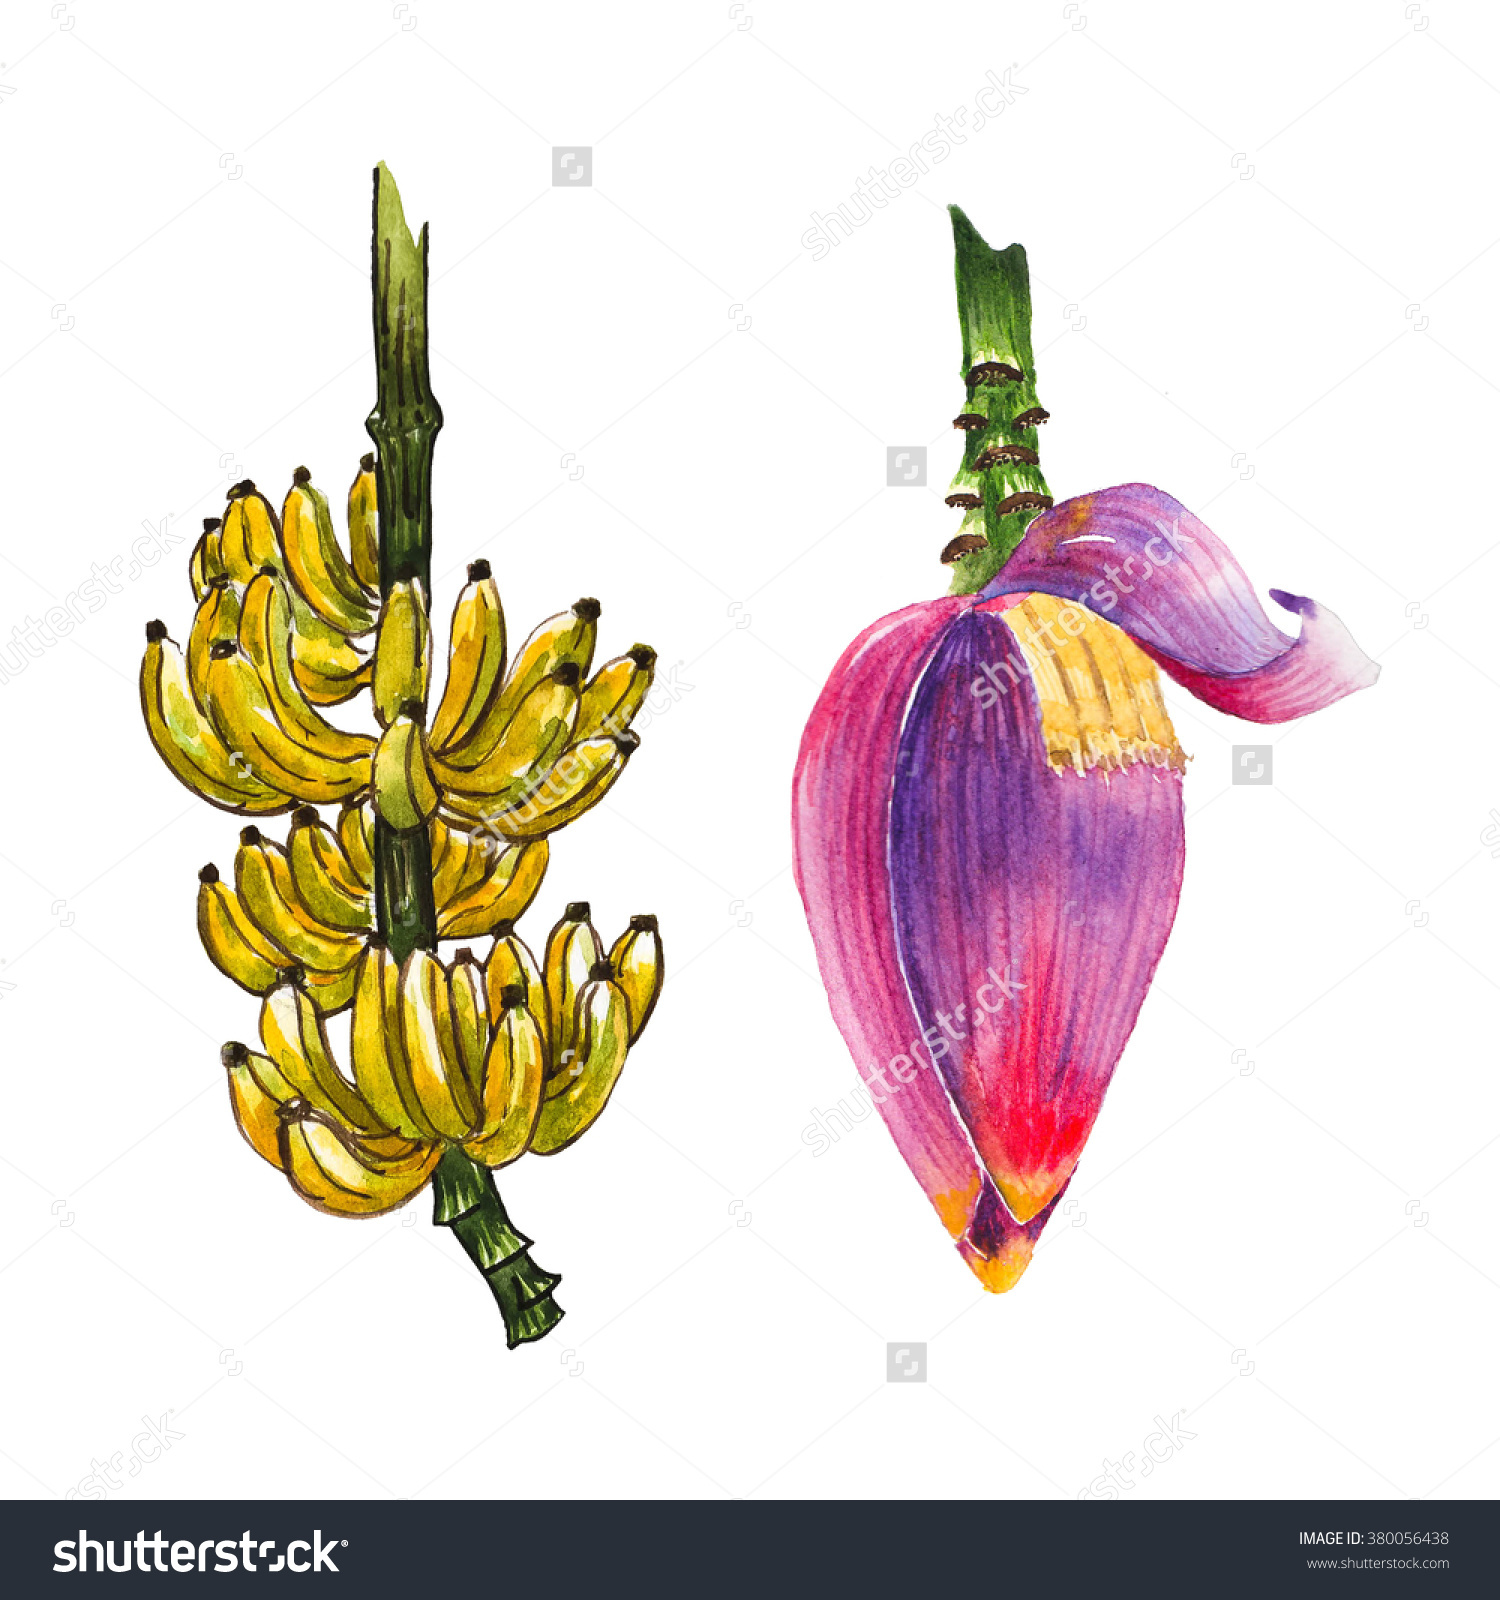 Yellow Banana Fruit Purple Banana Blossom Stock Illustration.